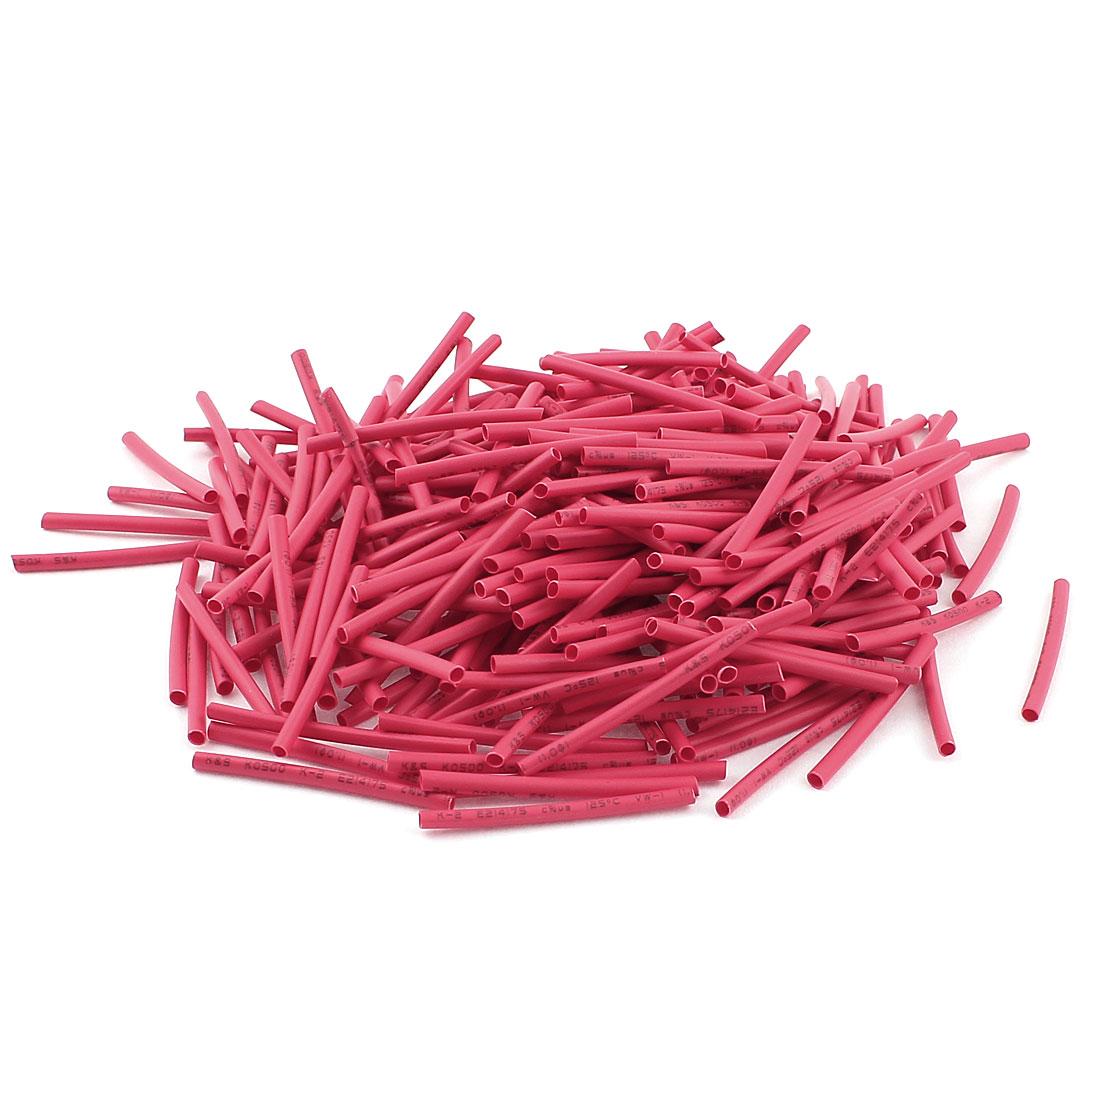 Red 1mm Dia 2:1 Polyolefin Heat Shrink Tubing Shrinkable Tube 30mm 350pcs